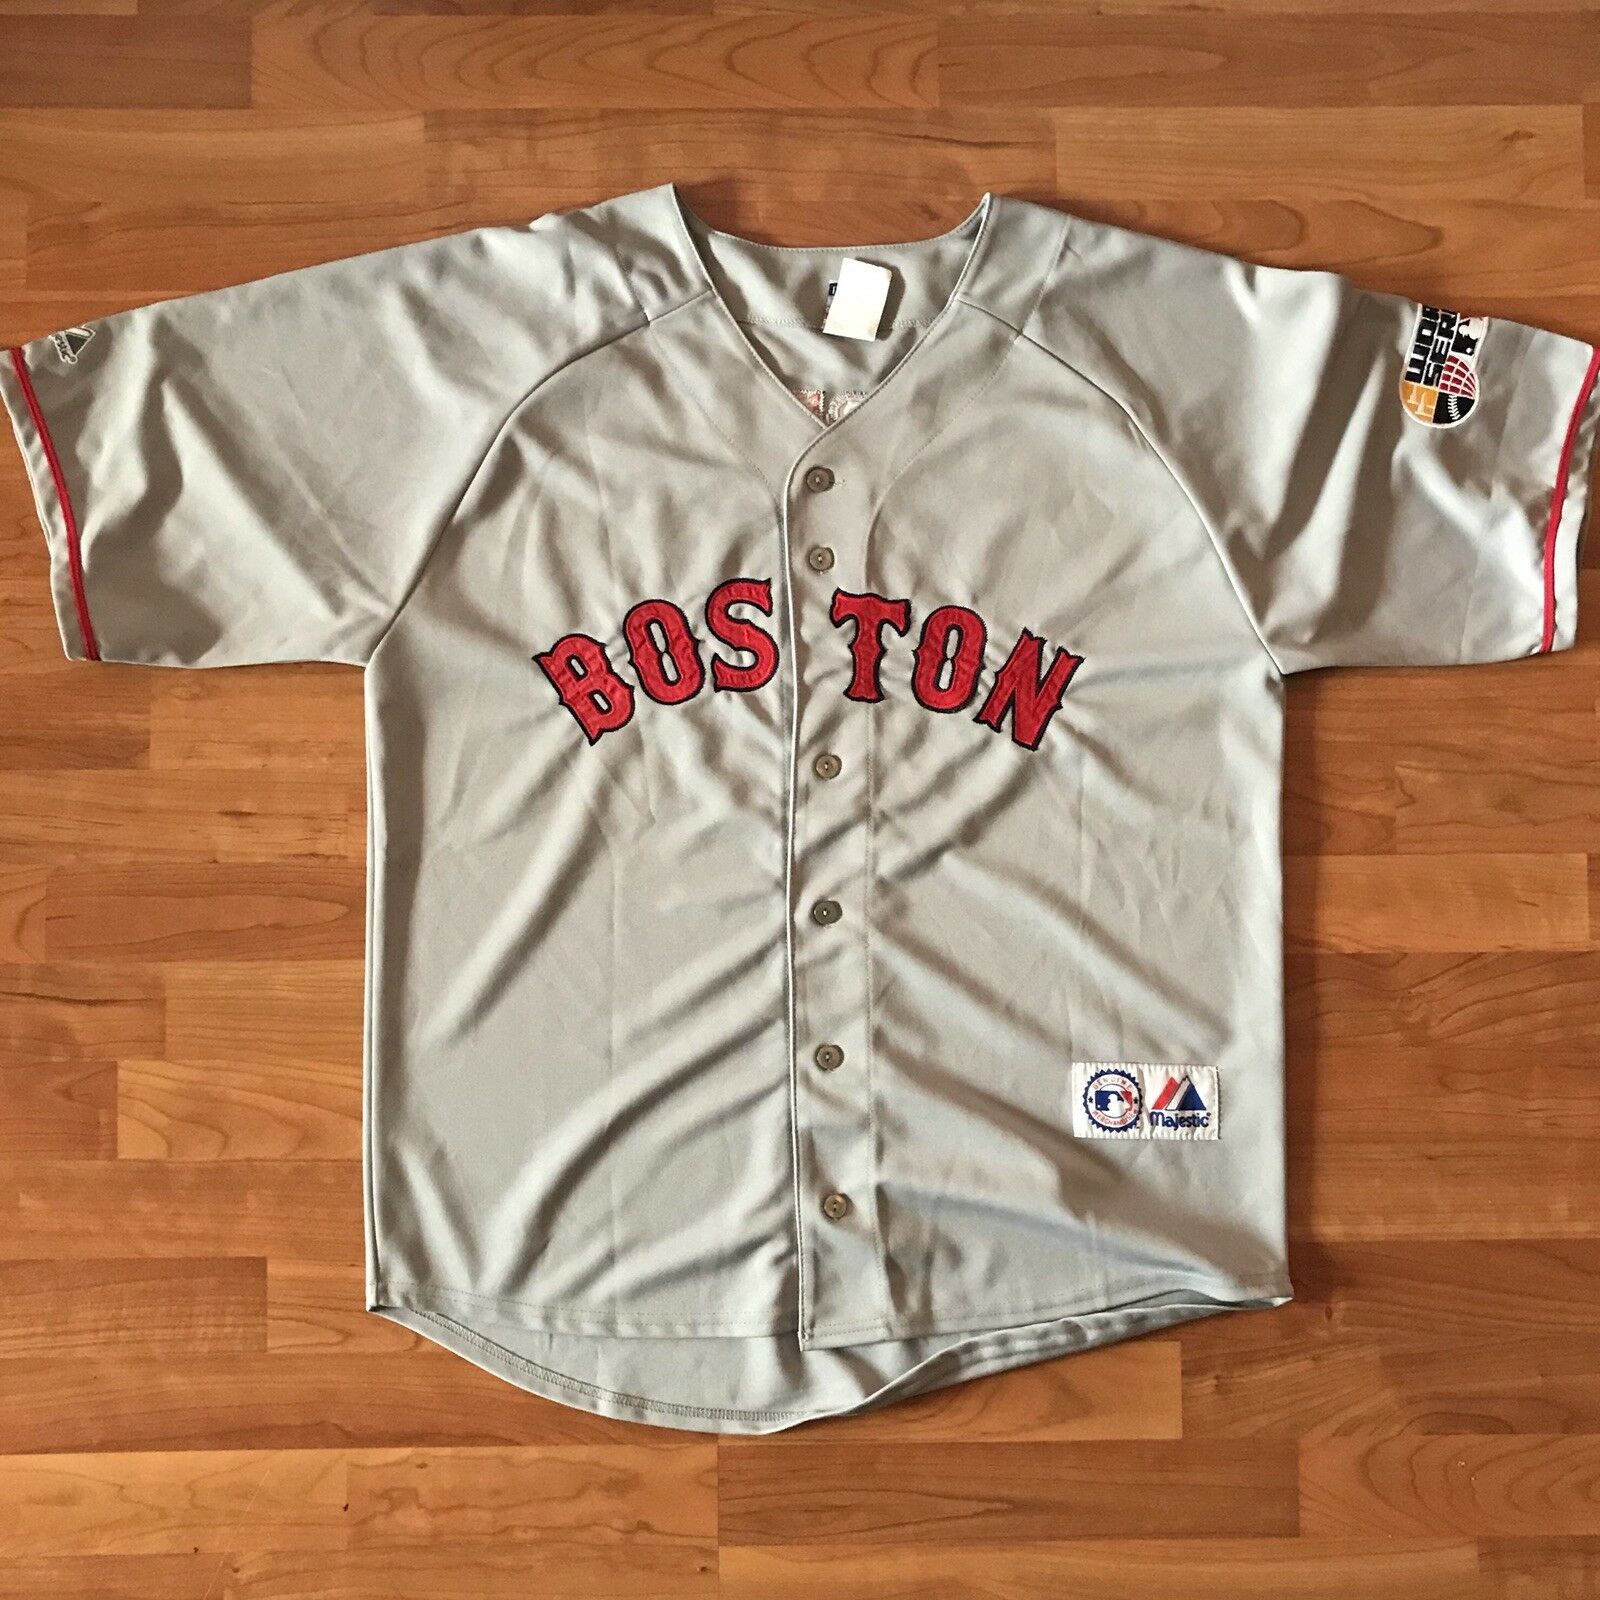 Boston ROT Sox Majestic 46 Trikot Jacoby Ellsbury  46 Majestic Größe XL World Series '07 d2f9a1